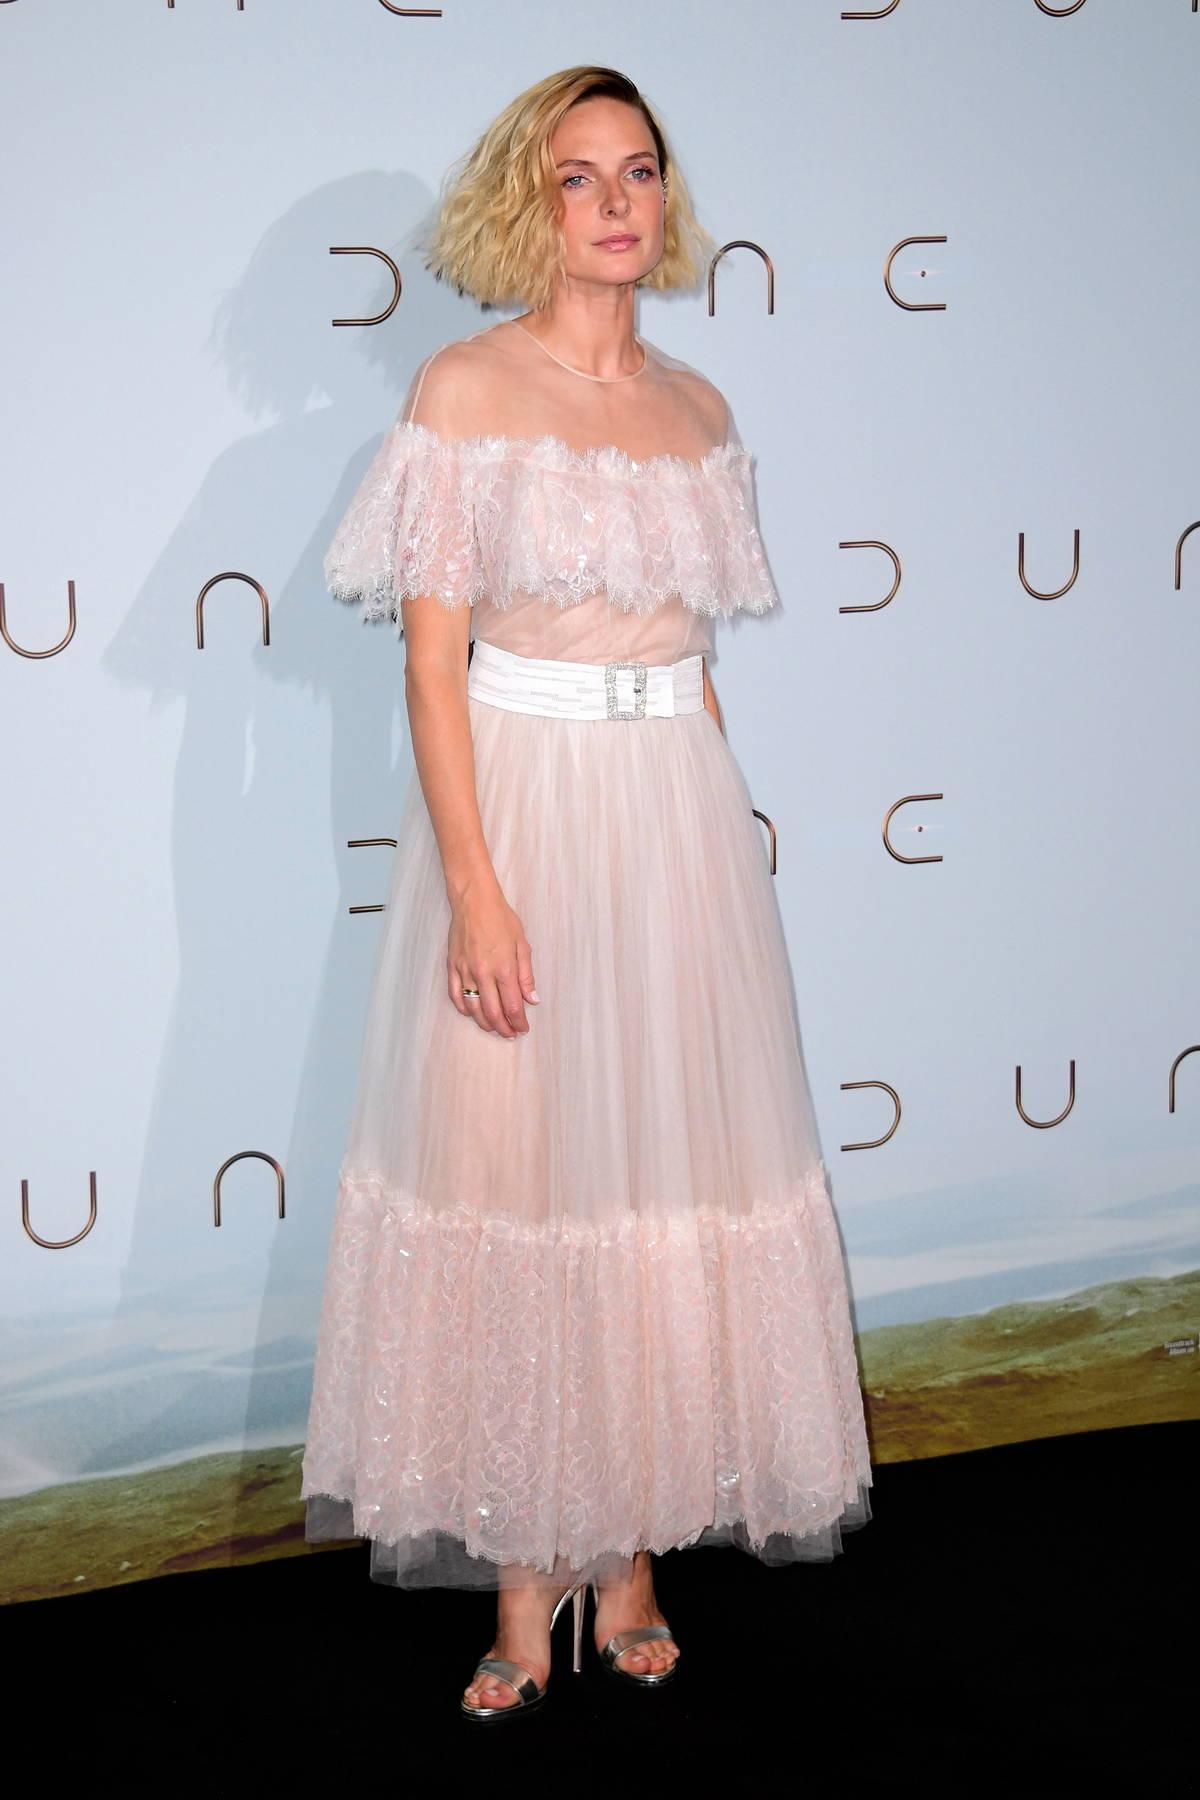 Rebecca Ferguson attends the Premiere of 'Dune' at Le Grand Rex in Paris, France